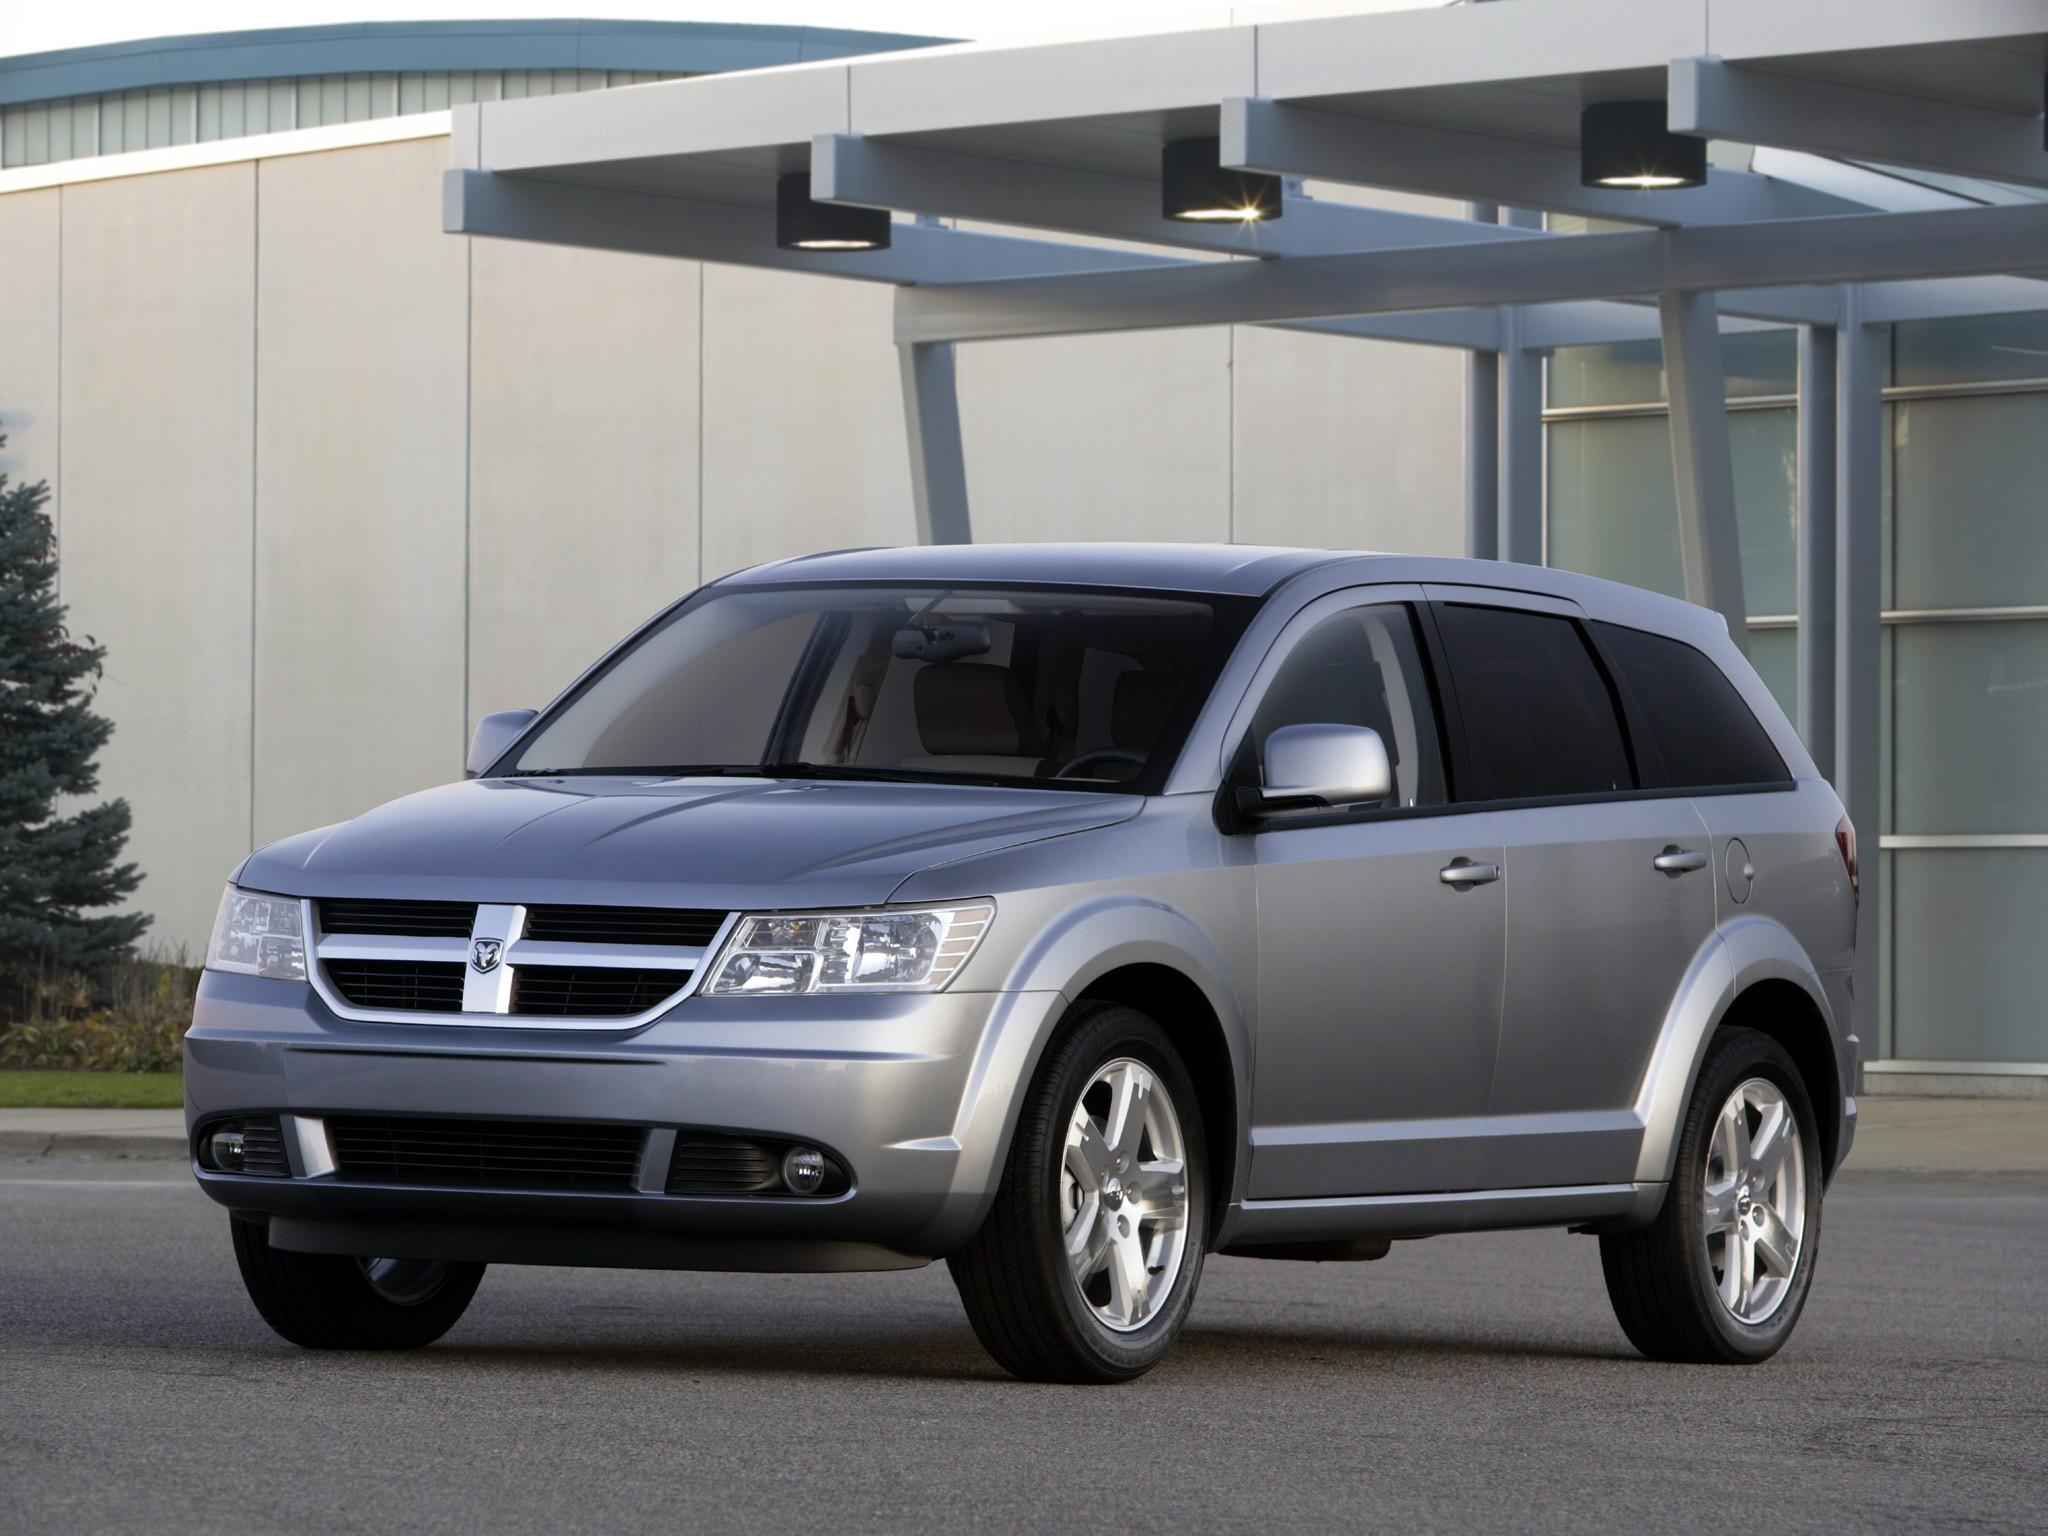 Reviews Of Dodge Journey >> DODGE Journey - 2008, 2009, 2010, 2011 - autoevolution